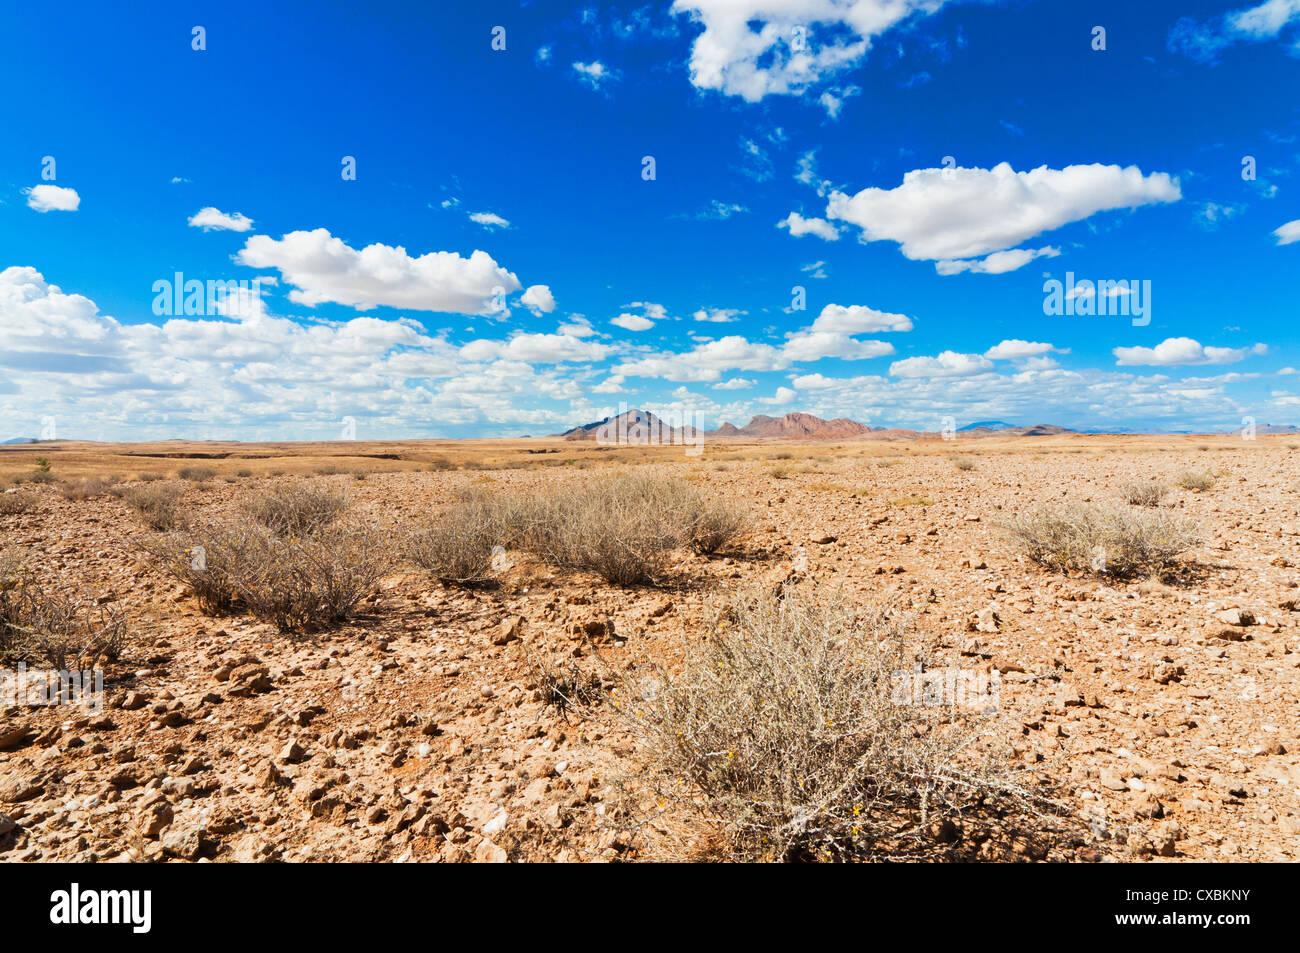 Namib desert, Namibia, Africa - Stock Image